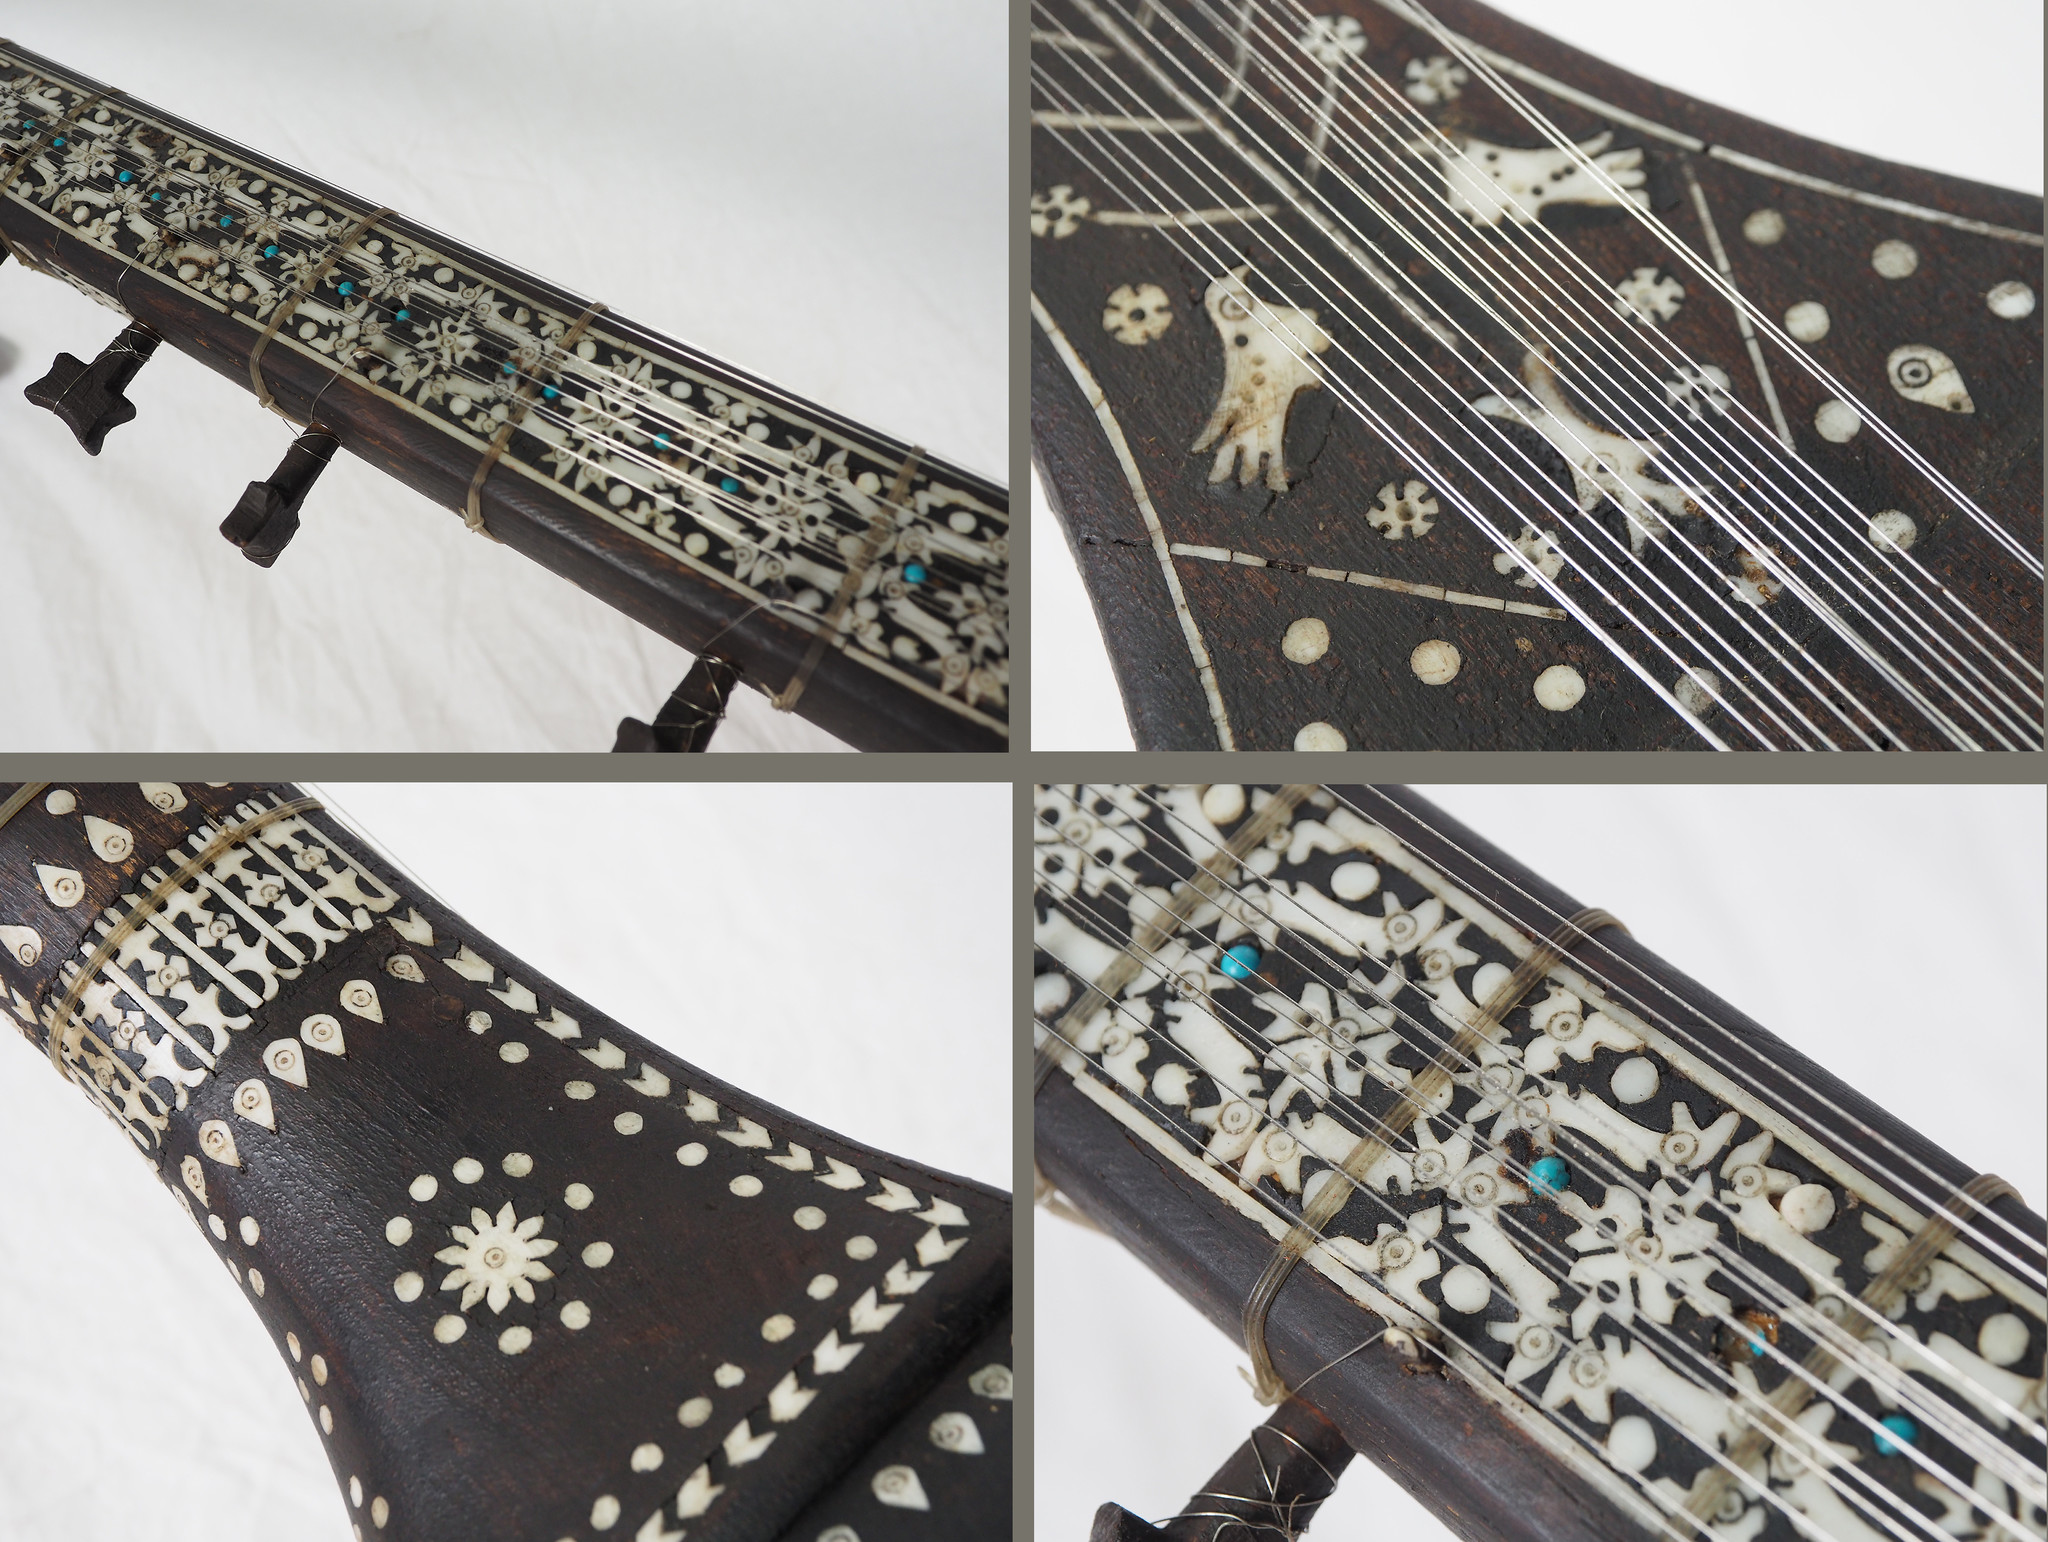 antik exotische traditionelle Volksmusikinstrument Afghanistan Tambur Tanbur tanboor Afghan Langhalslaute تنبور Nr-21